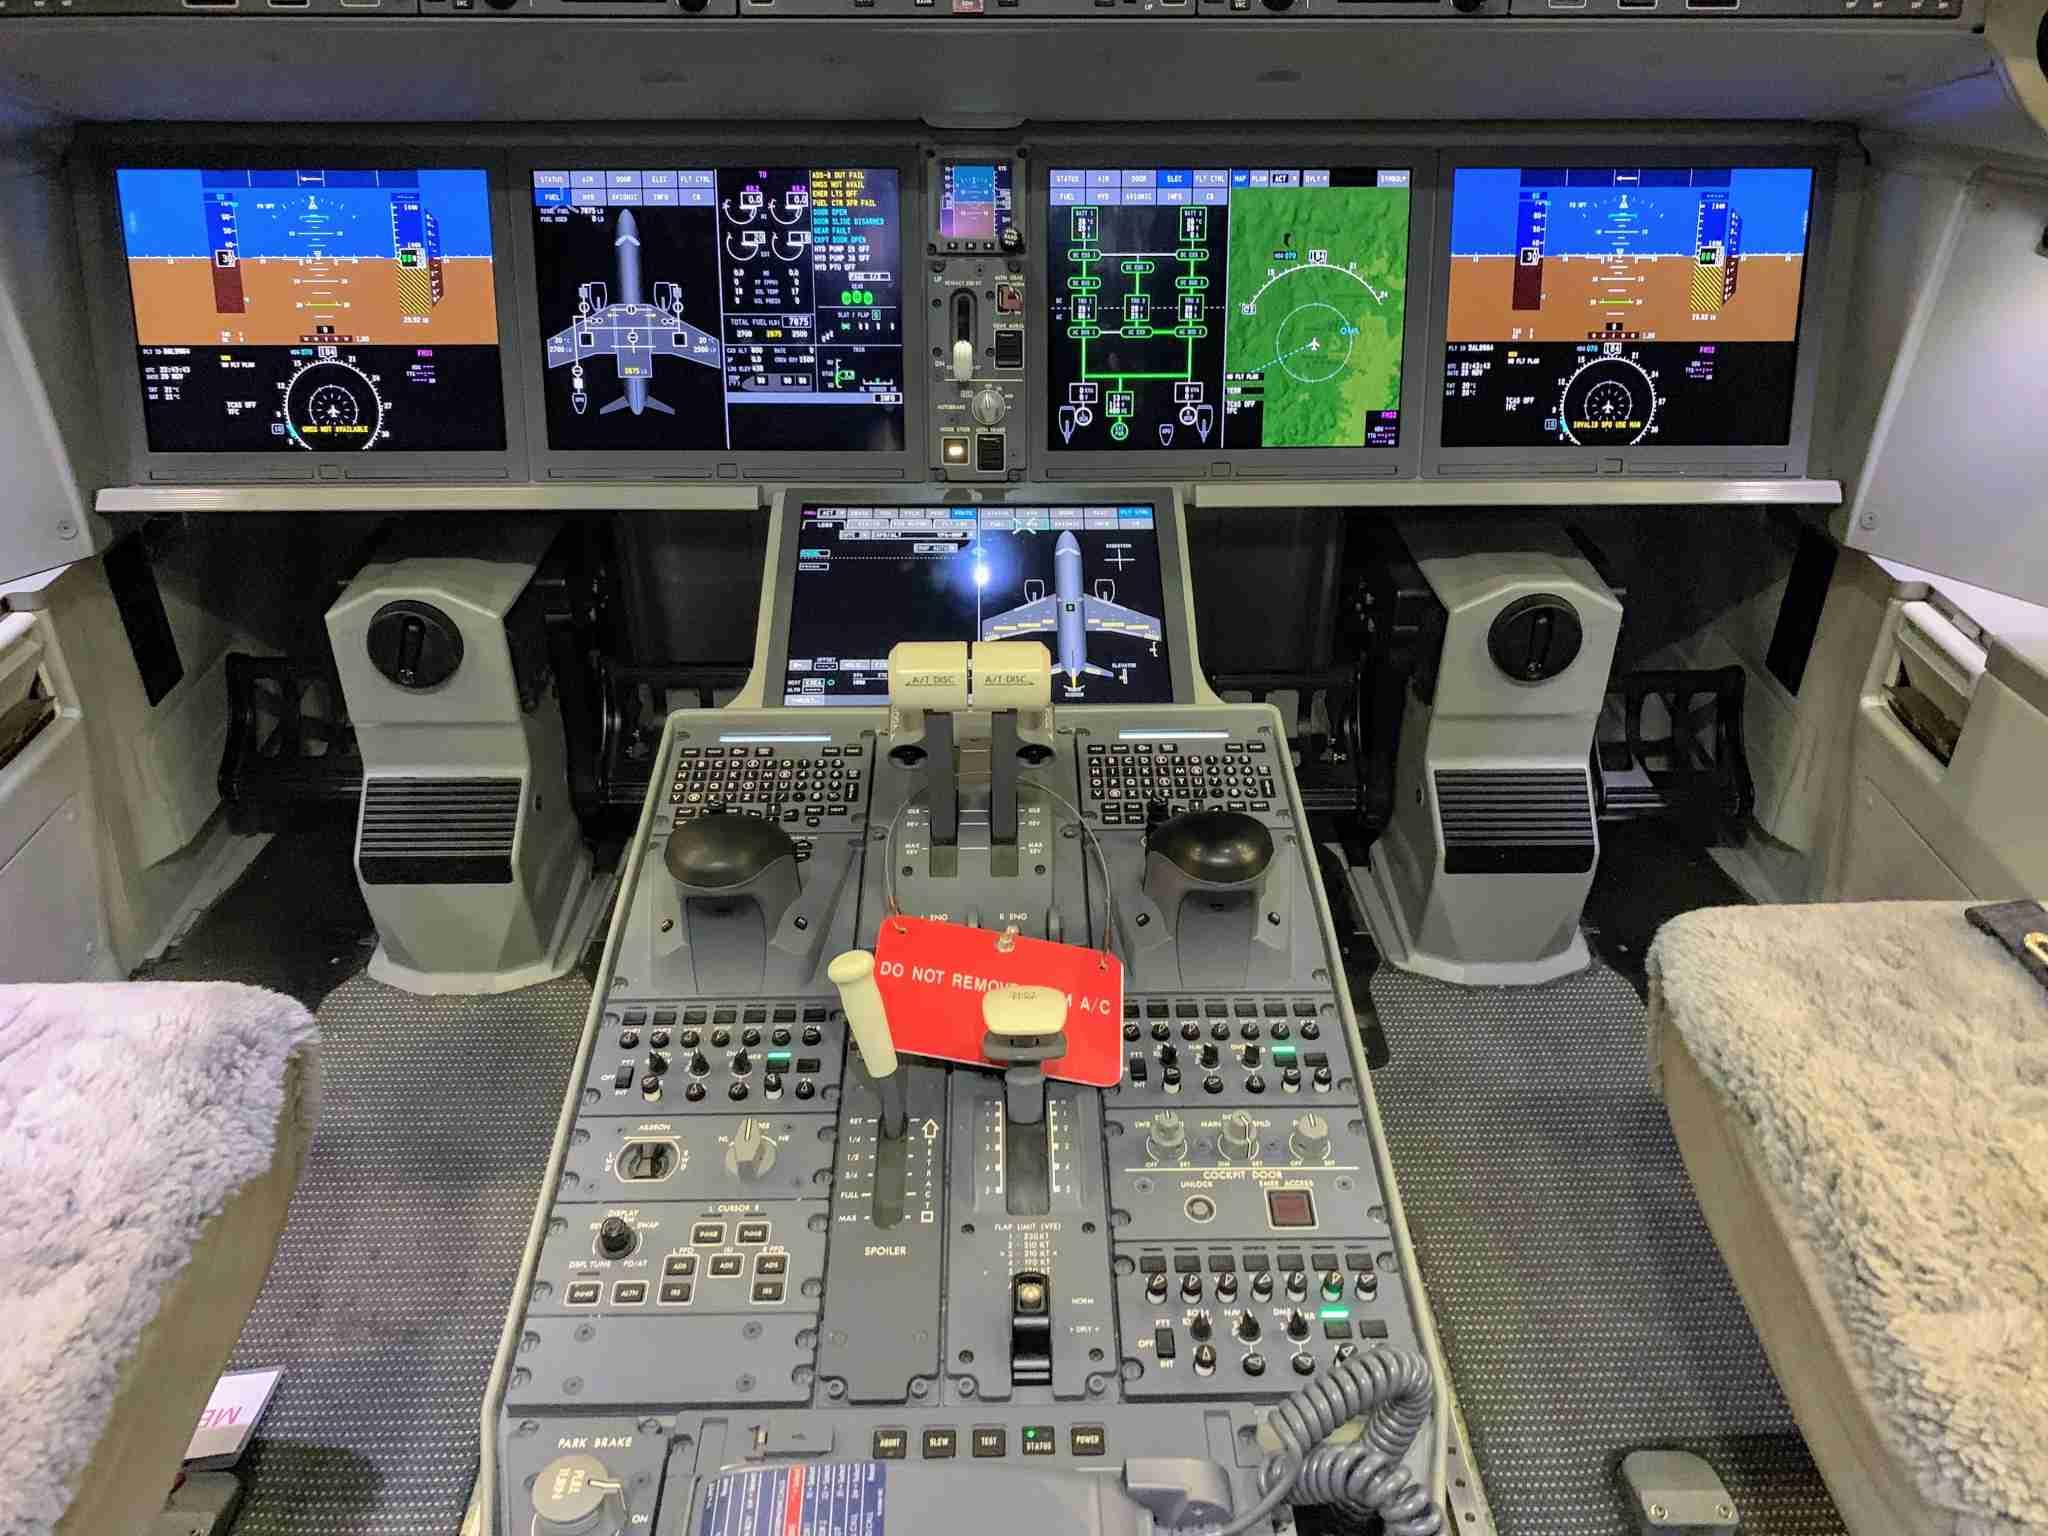 Delta Airbus A220 C Series CS100 Preview at ATL - zoom